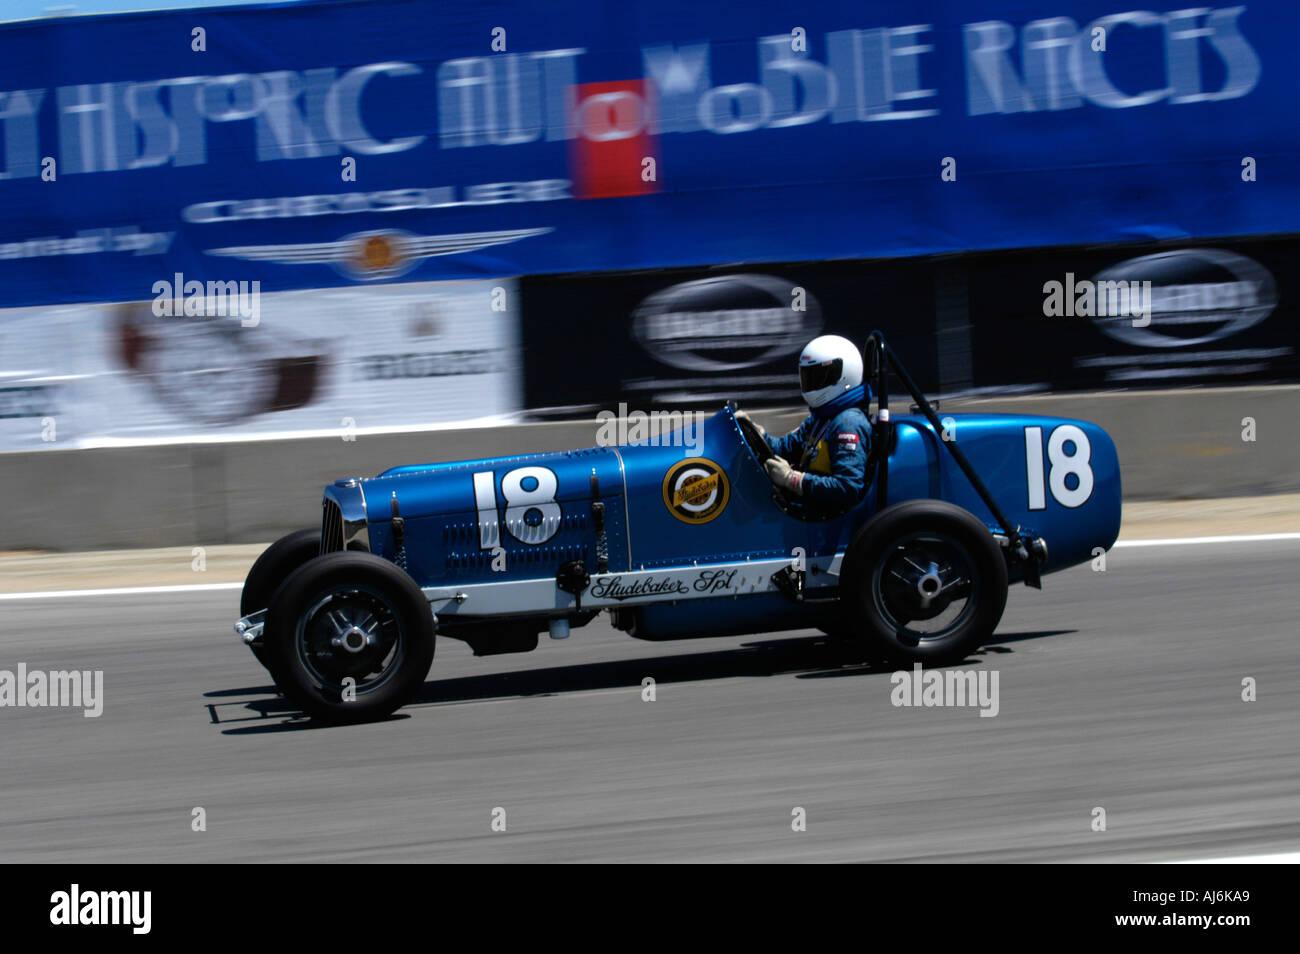 Race Car Driving 1930s Stock Photos Amp Race Car Driving 1930s Stock Images Alamy